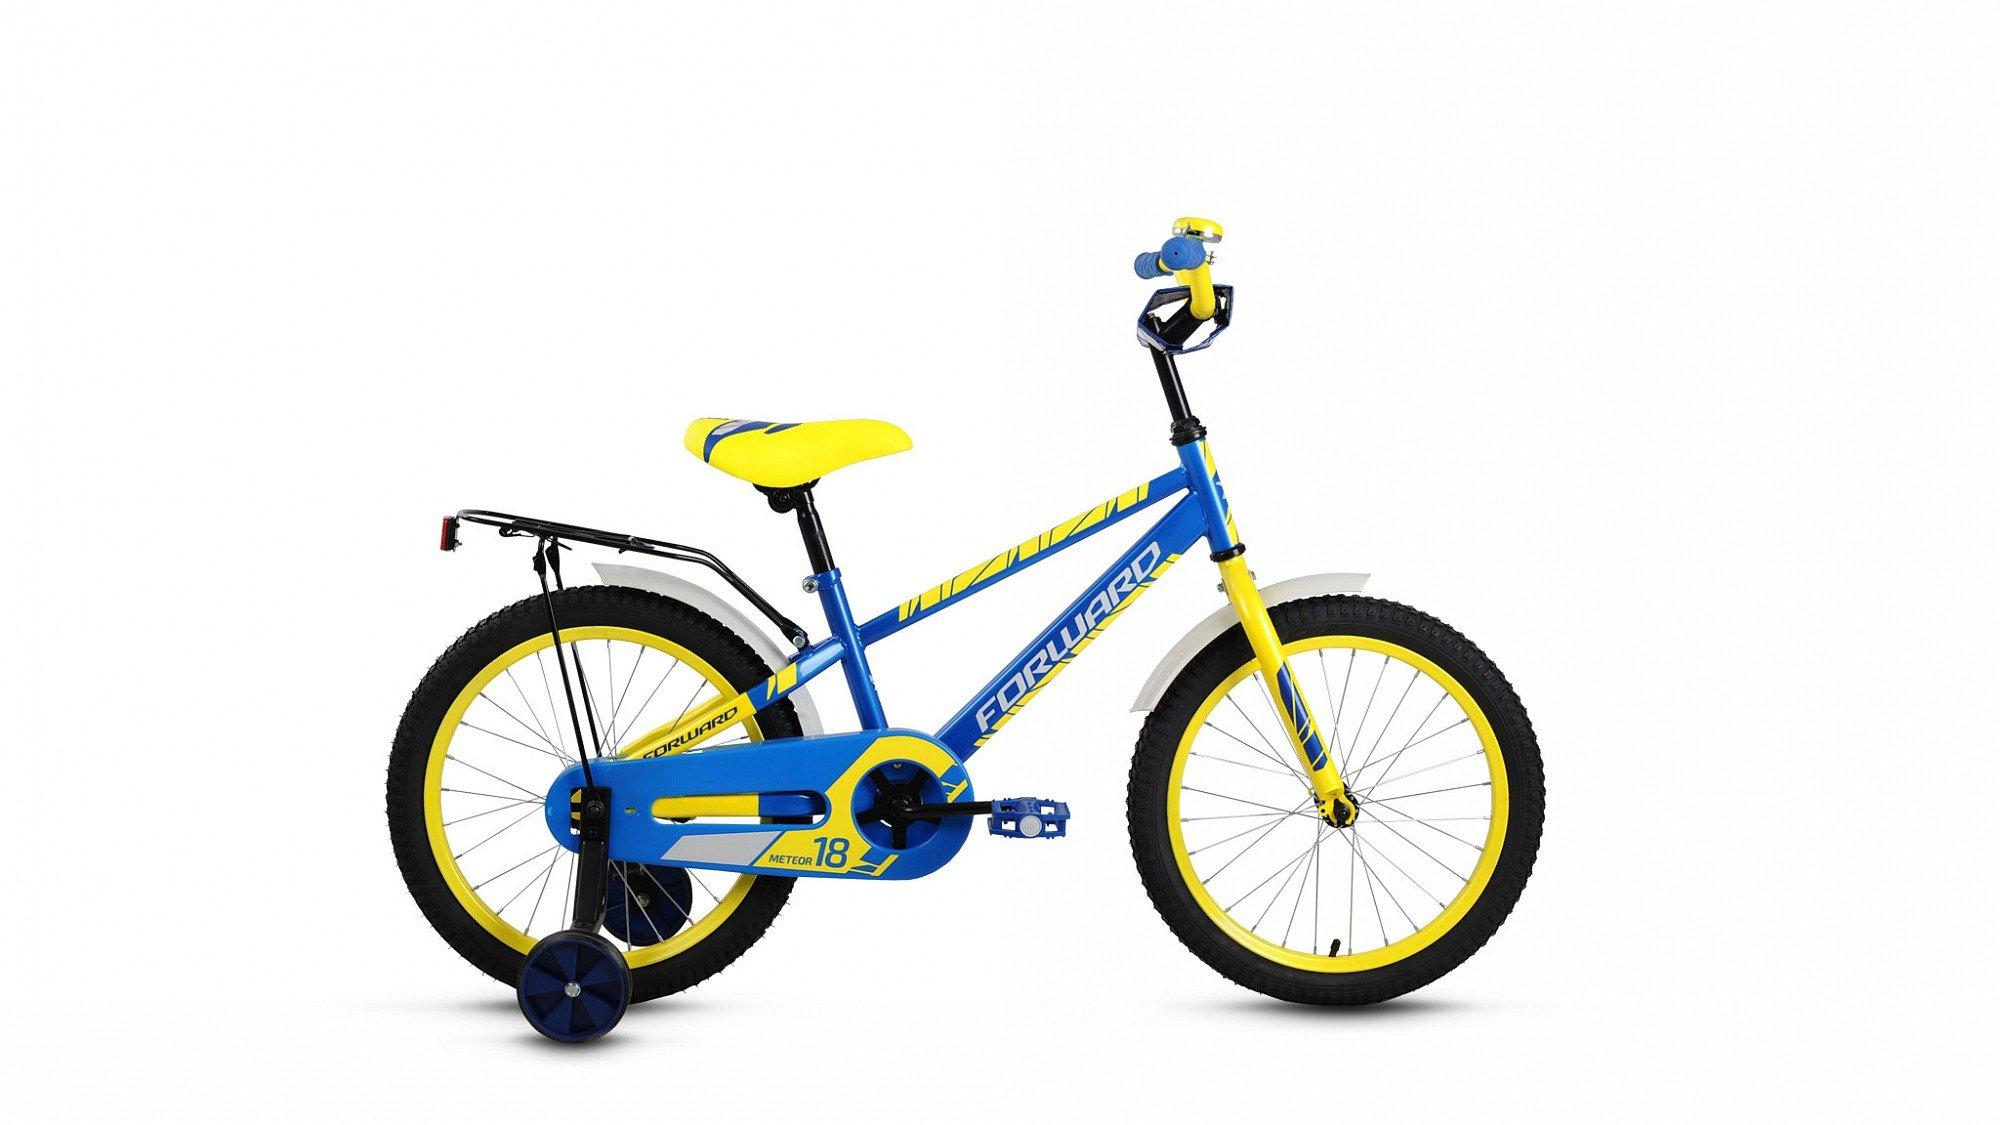 35976dbc97de Детский велосипед Fоrward meteor 18 - Веломан Обнинск. Магазин ...